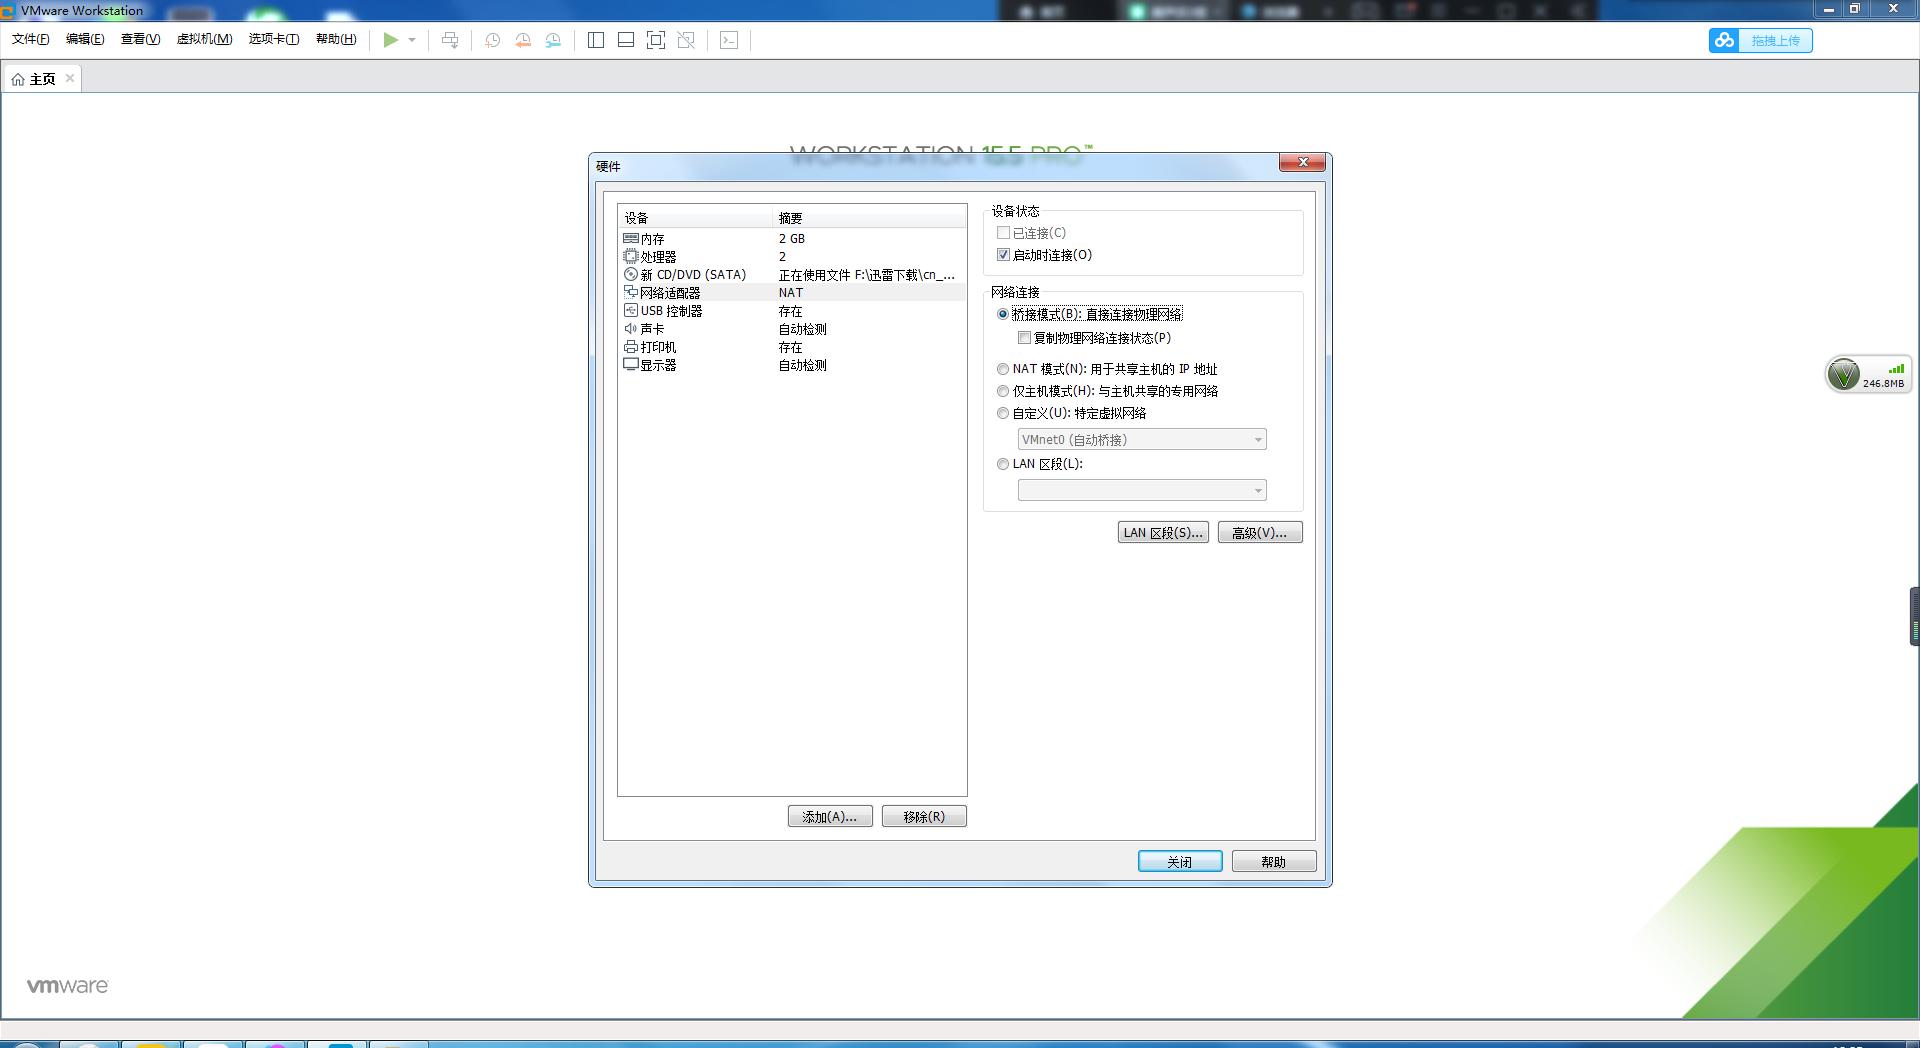 rBAAdmBpXF-AXESIAALPh0HzTWg151.jpg插图(6)